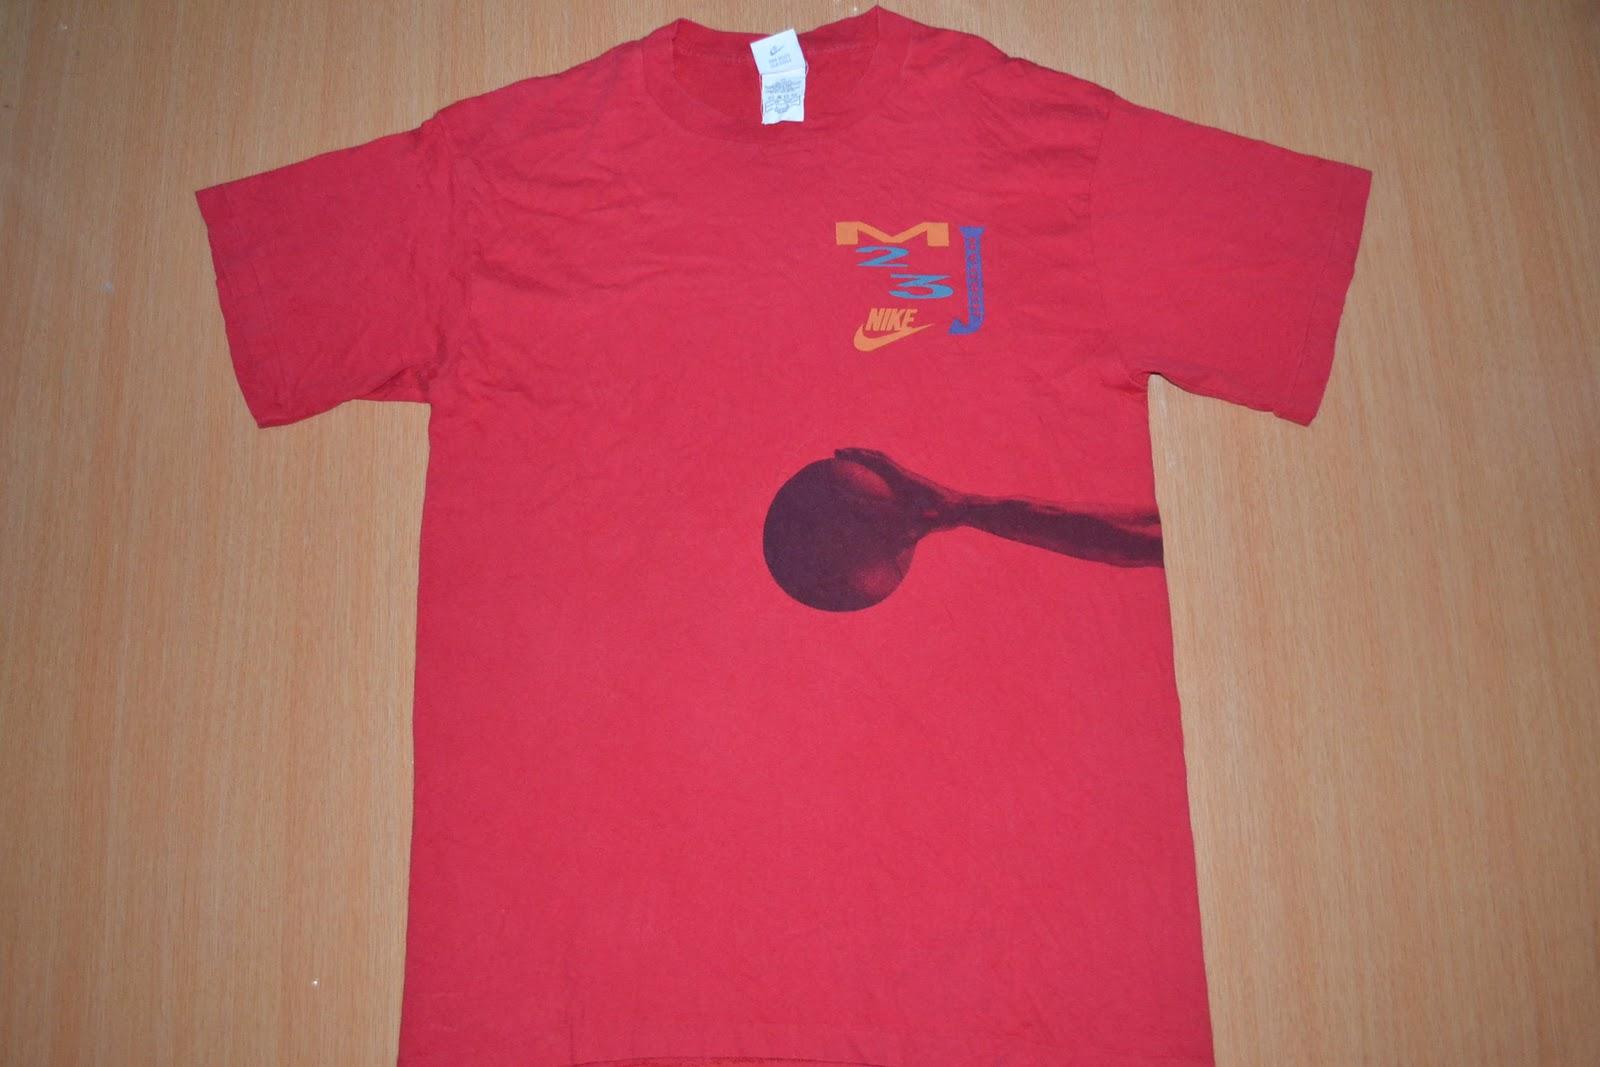 0b69a7e3761 OldSchoolZone: Vintage 90s NIKE Michael Jordan T-shirt (SOLD)